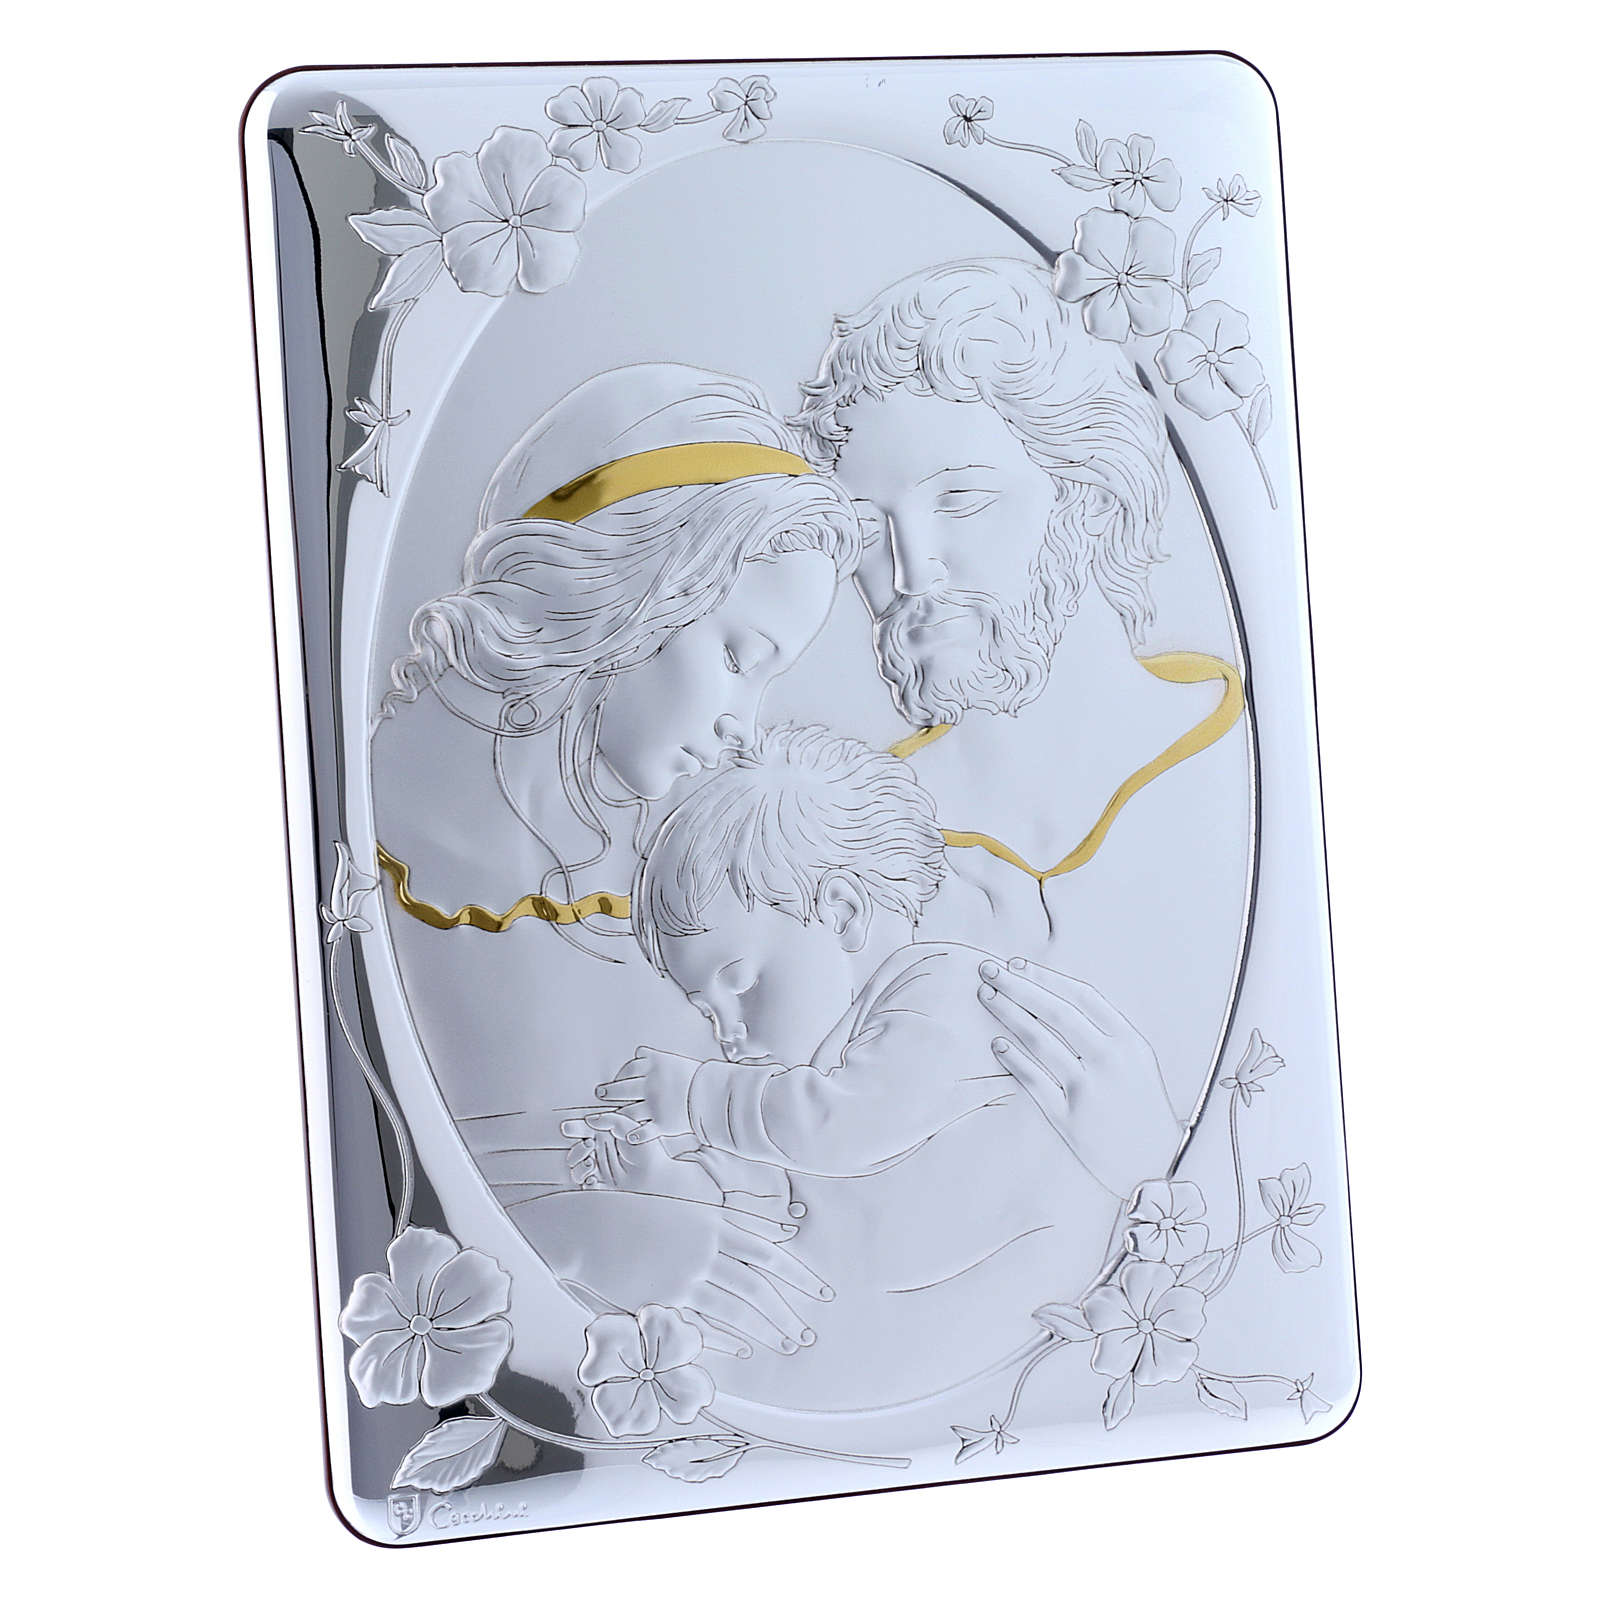 Cuadro bilaminado parte posterior madera preciosa Sagrada Familia detalles oro 33x25 cm 4